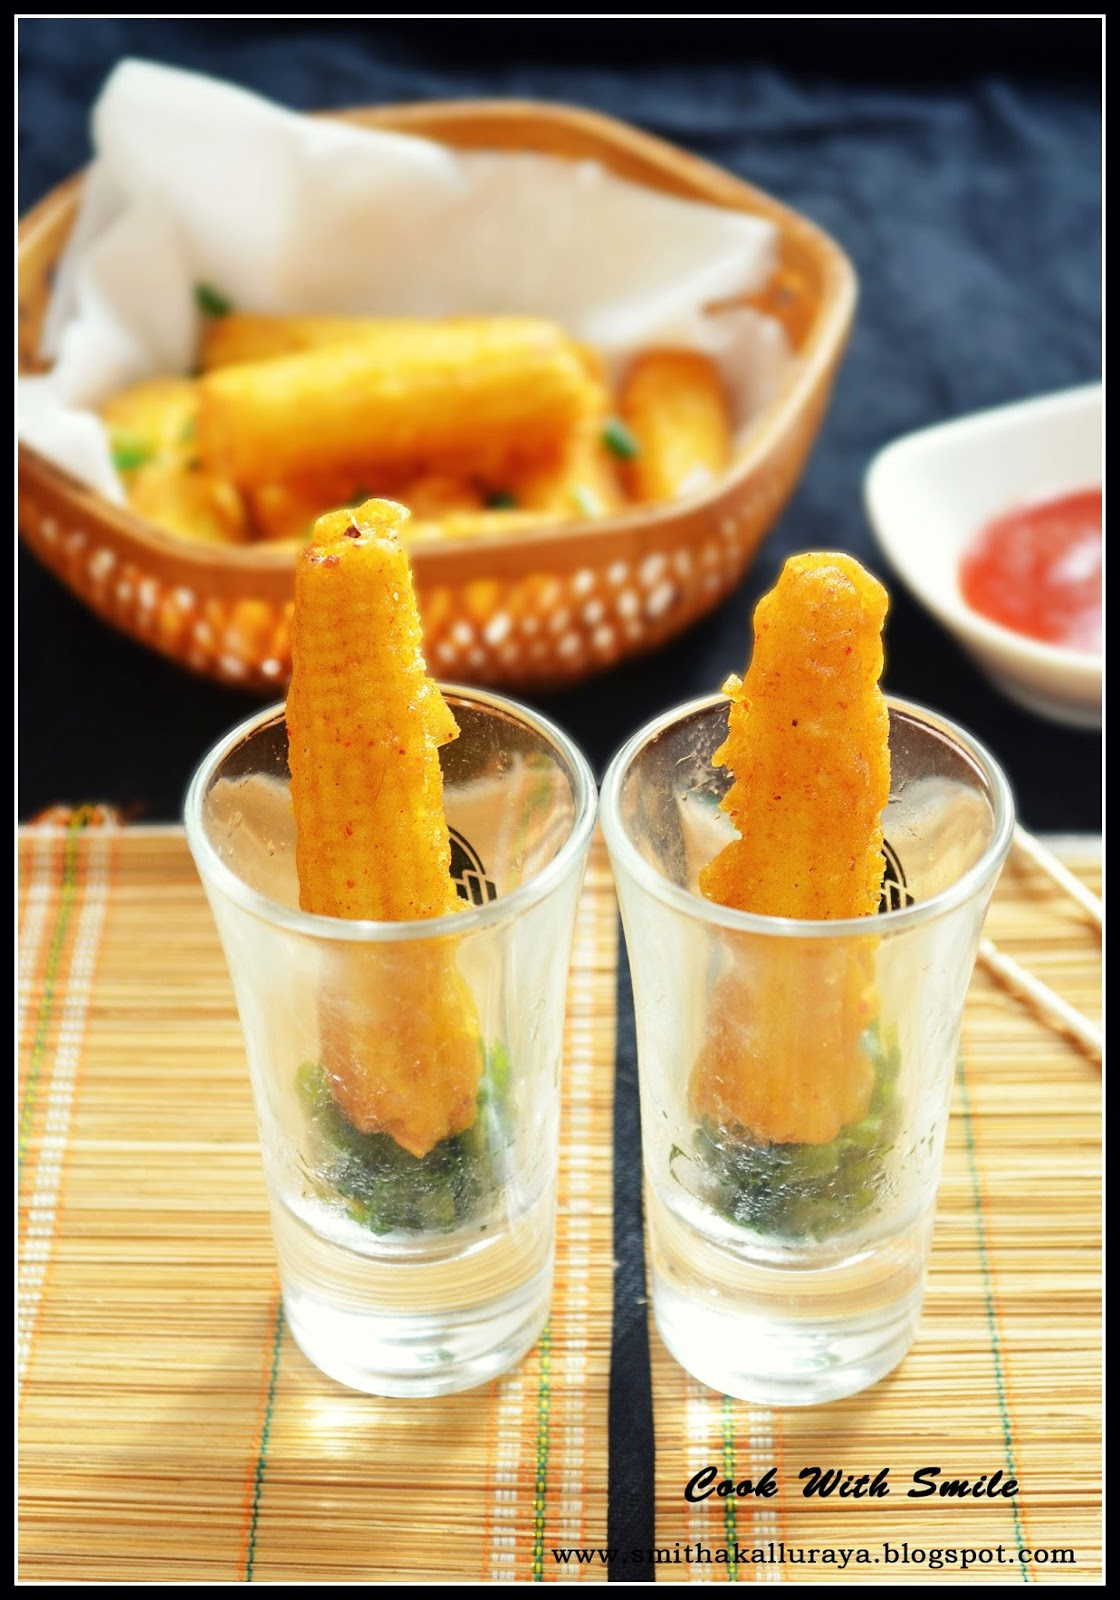 corn fritters recipe,baby corn 65,baby corn 65 recipe,crispy baby corn ...